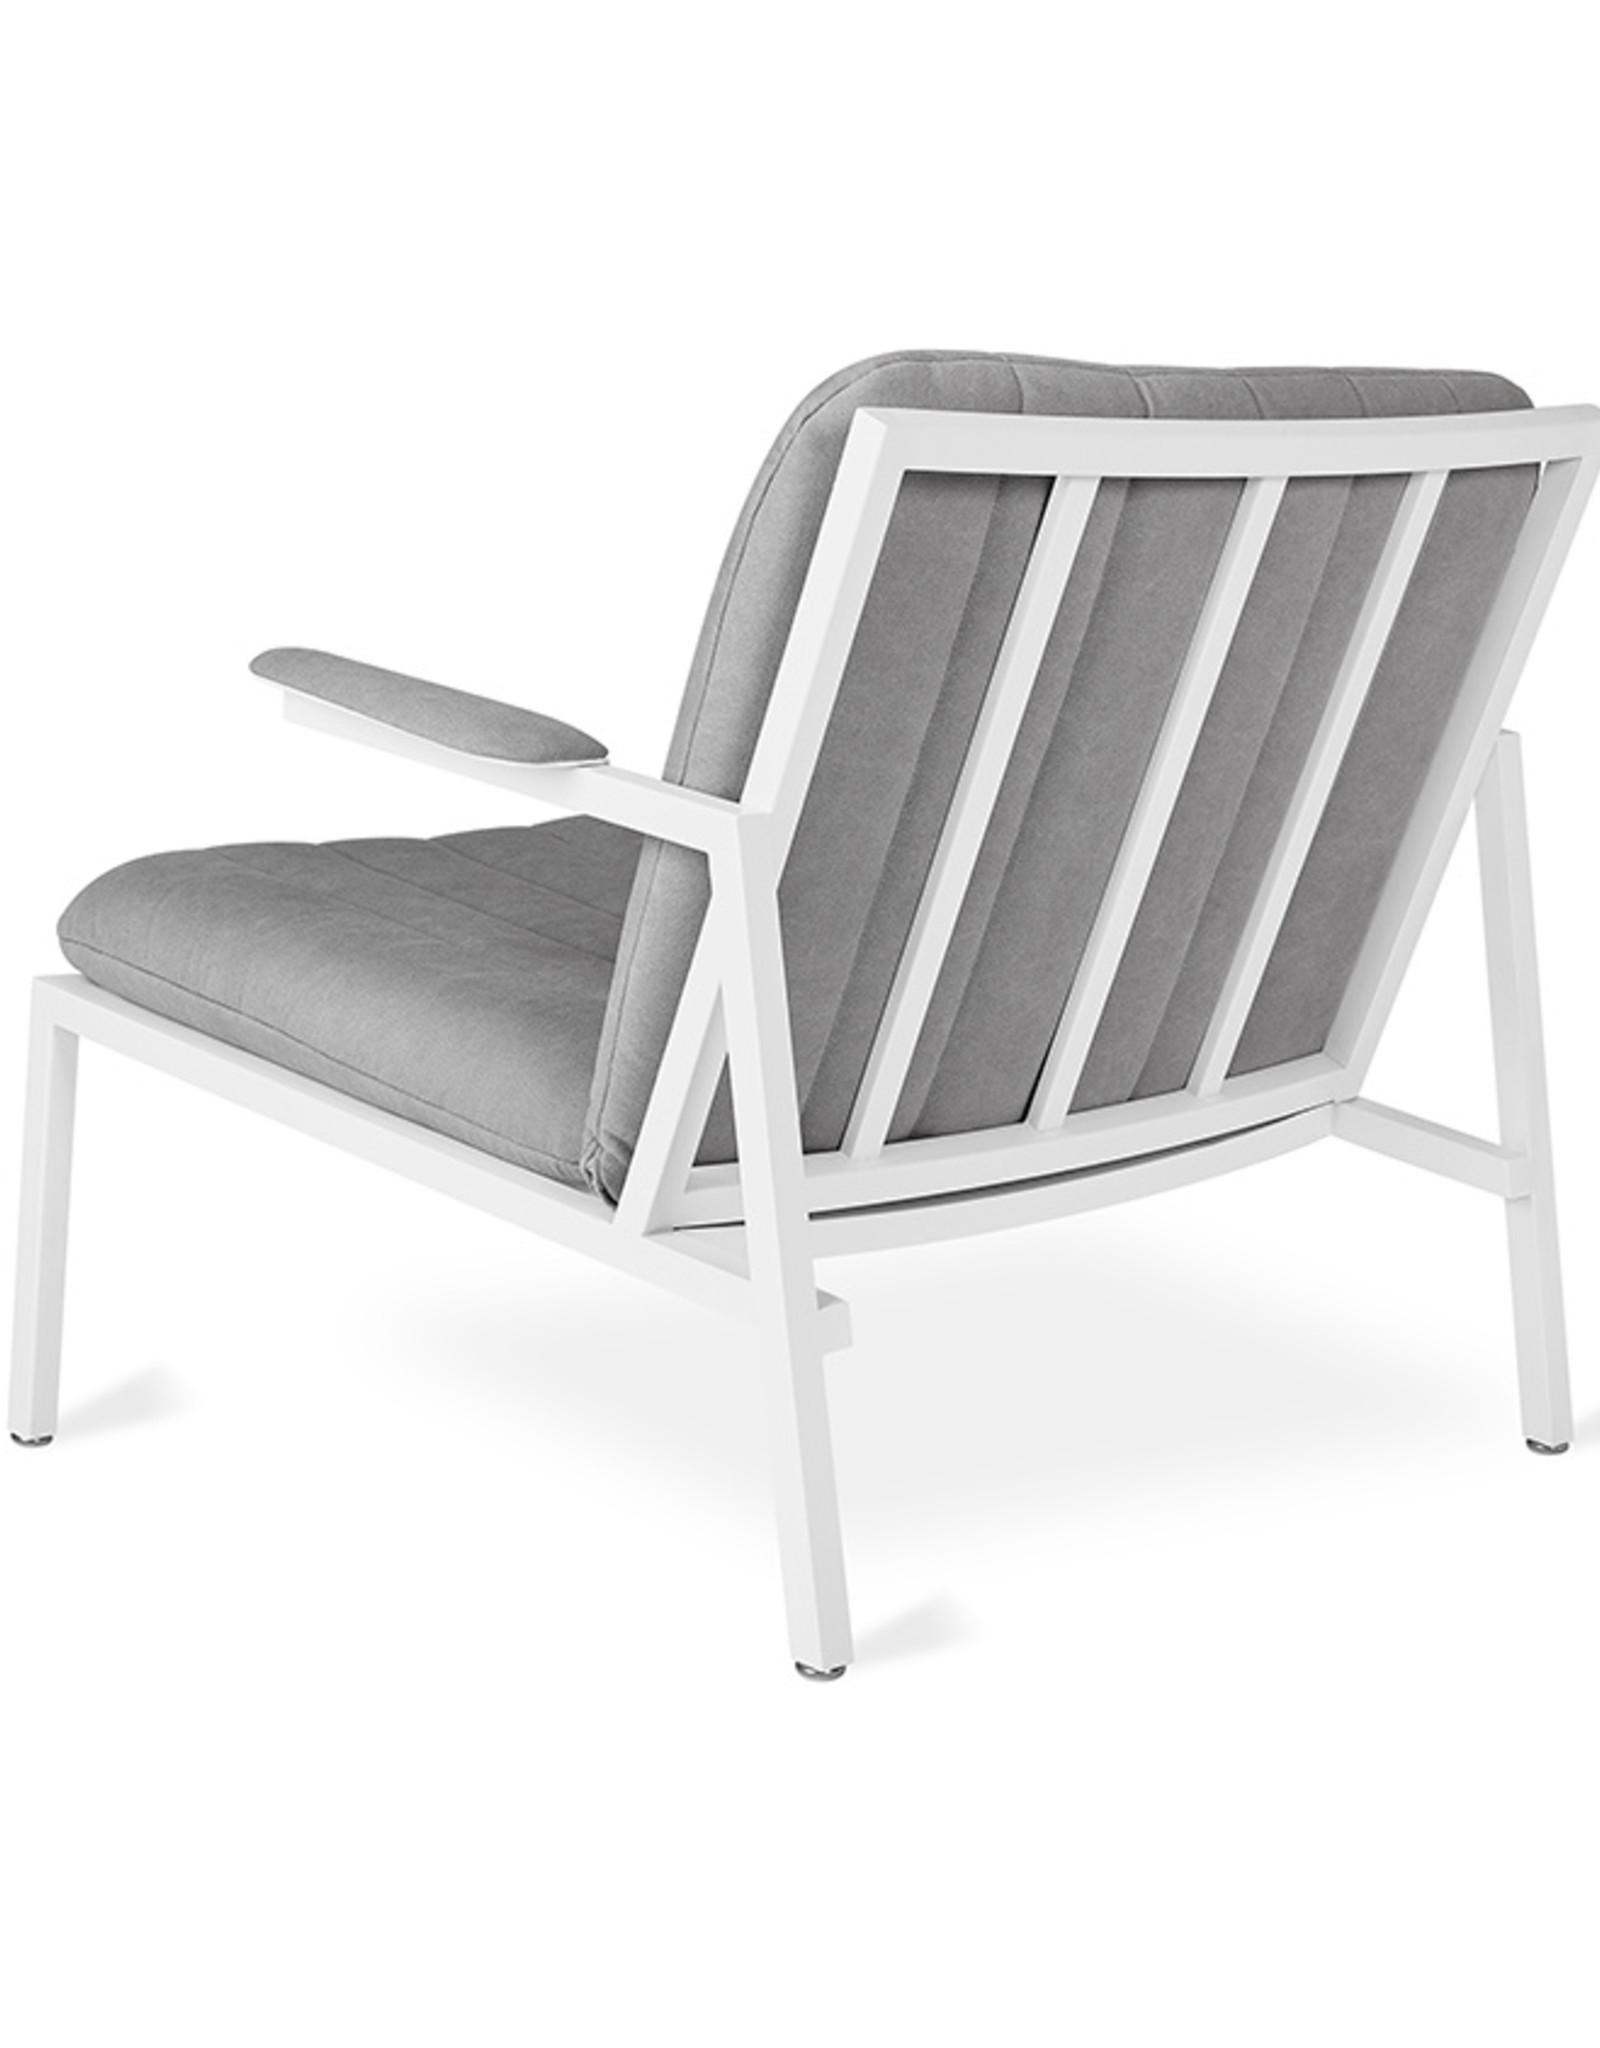 Gus* Modern Dunlop Chair